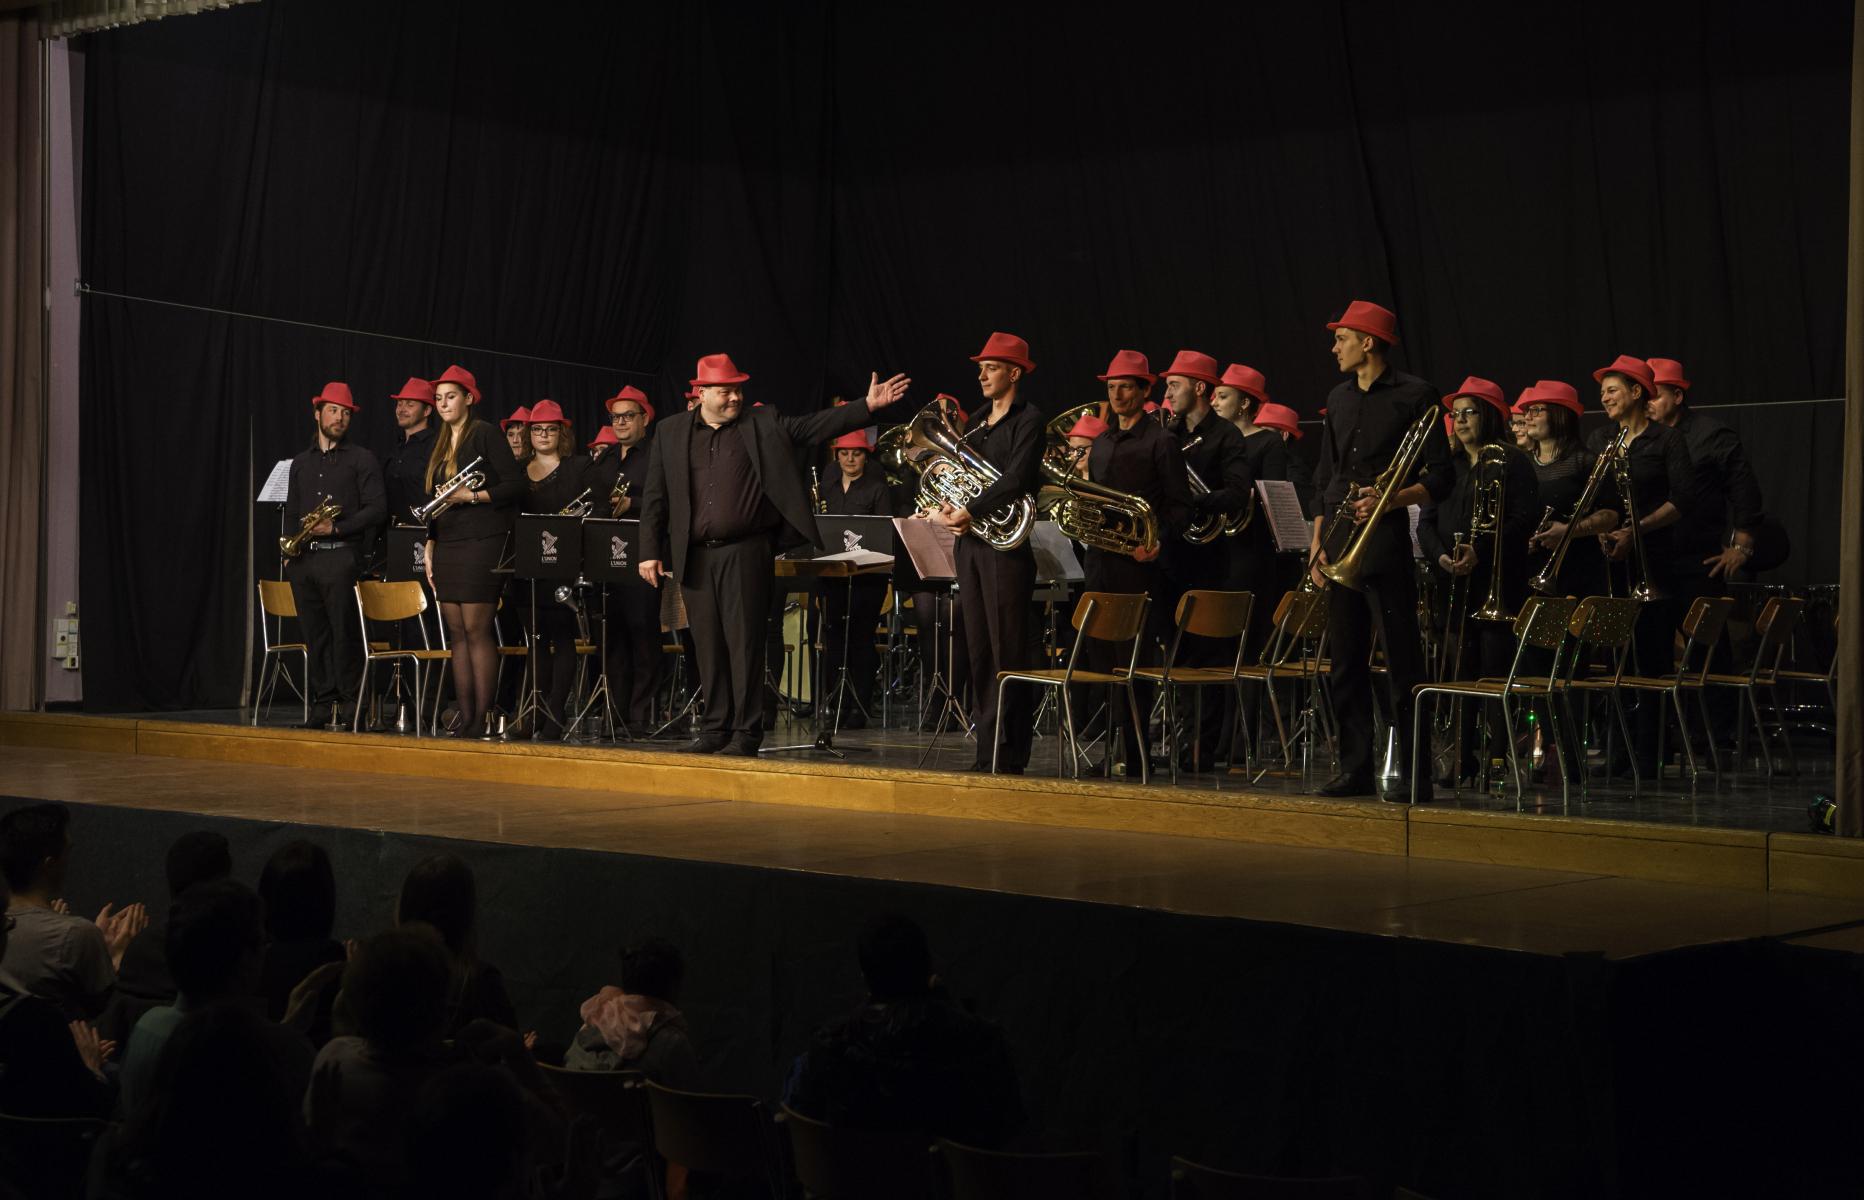 170211_concert_annuel17-070